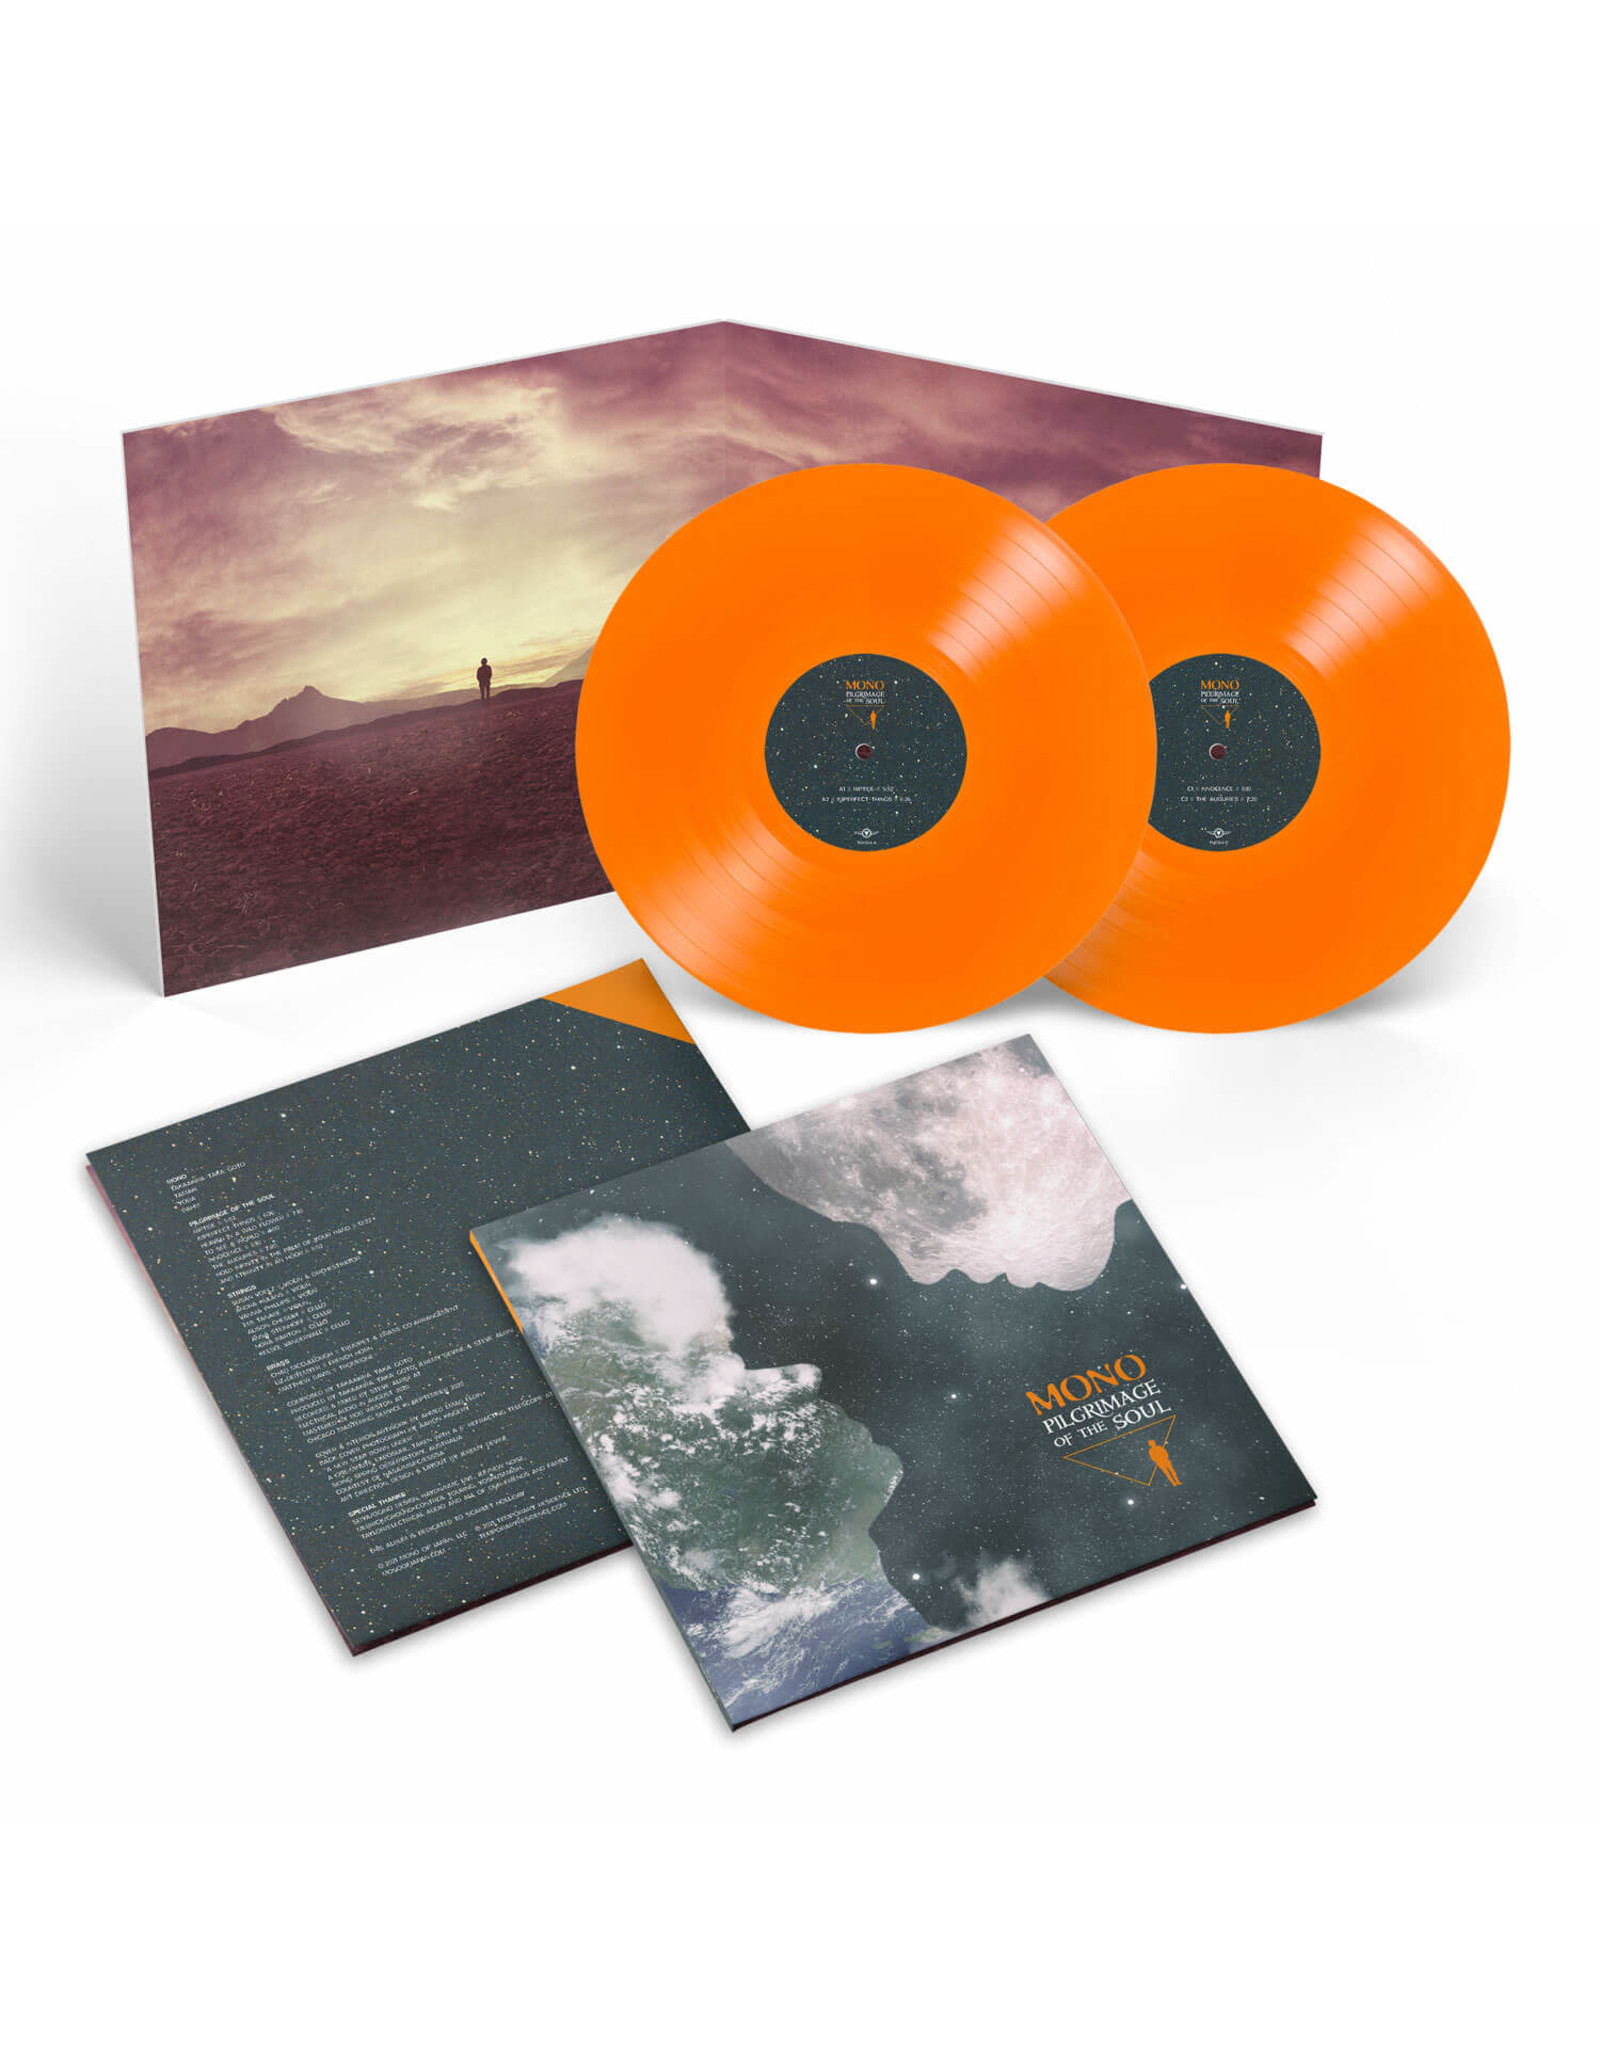 Mono - Pilgrimage of the Soul 2LP (orange vinyl)